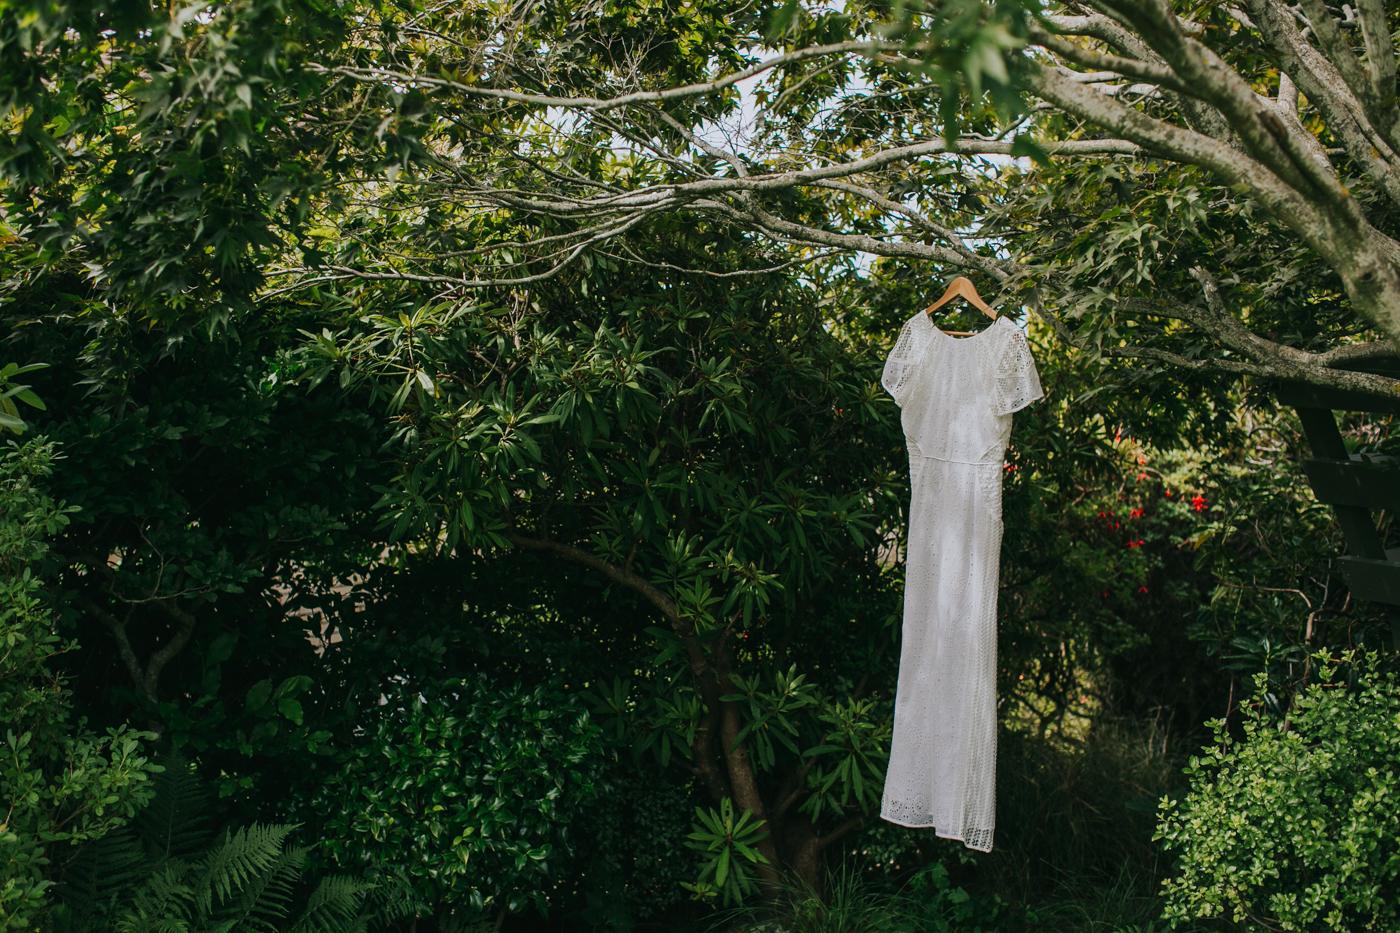 Ariana & Tim - Dunedin, New Zealand Wedding - Destination Wedding - Samantha Heather Photography-26.jpg